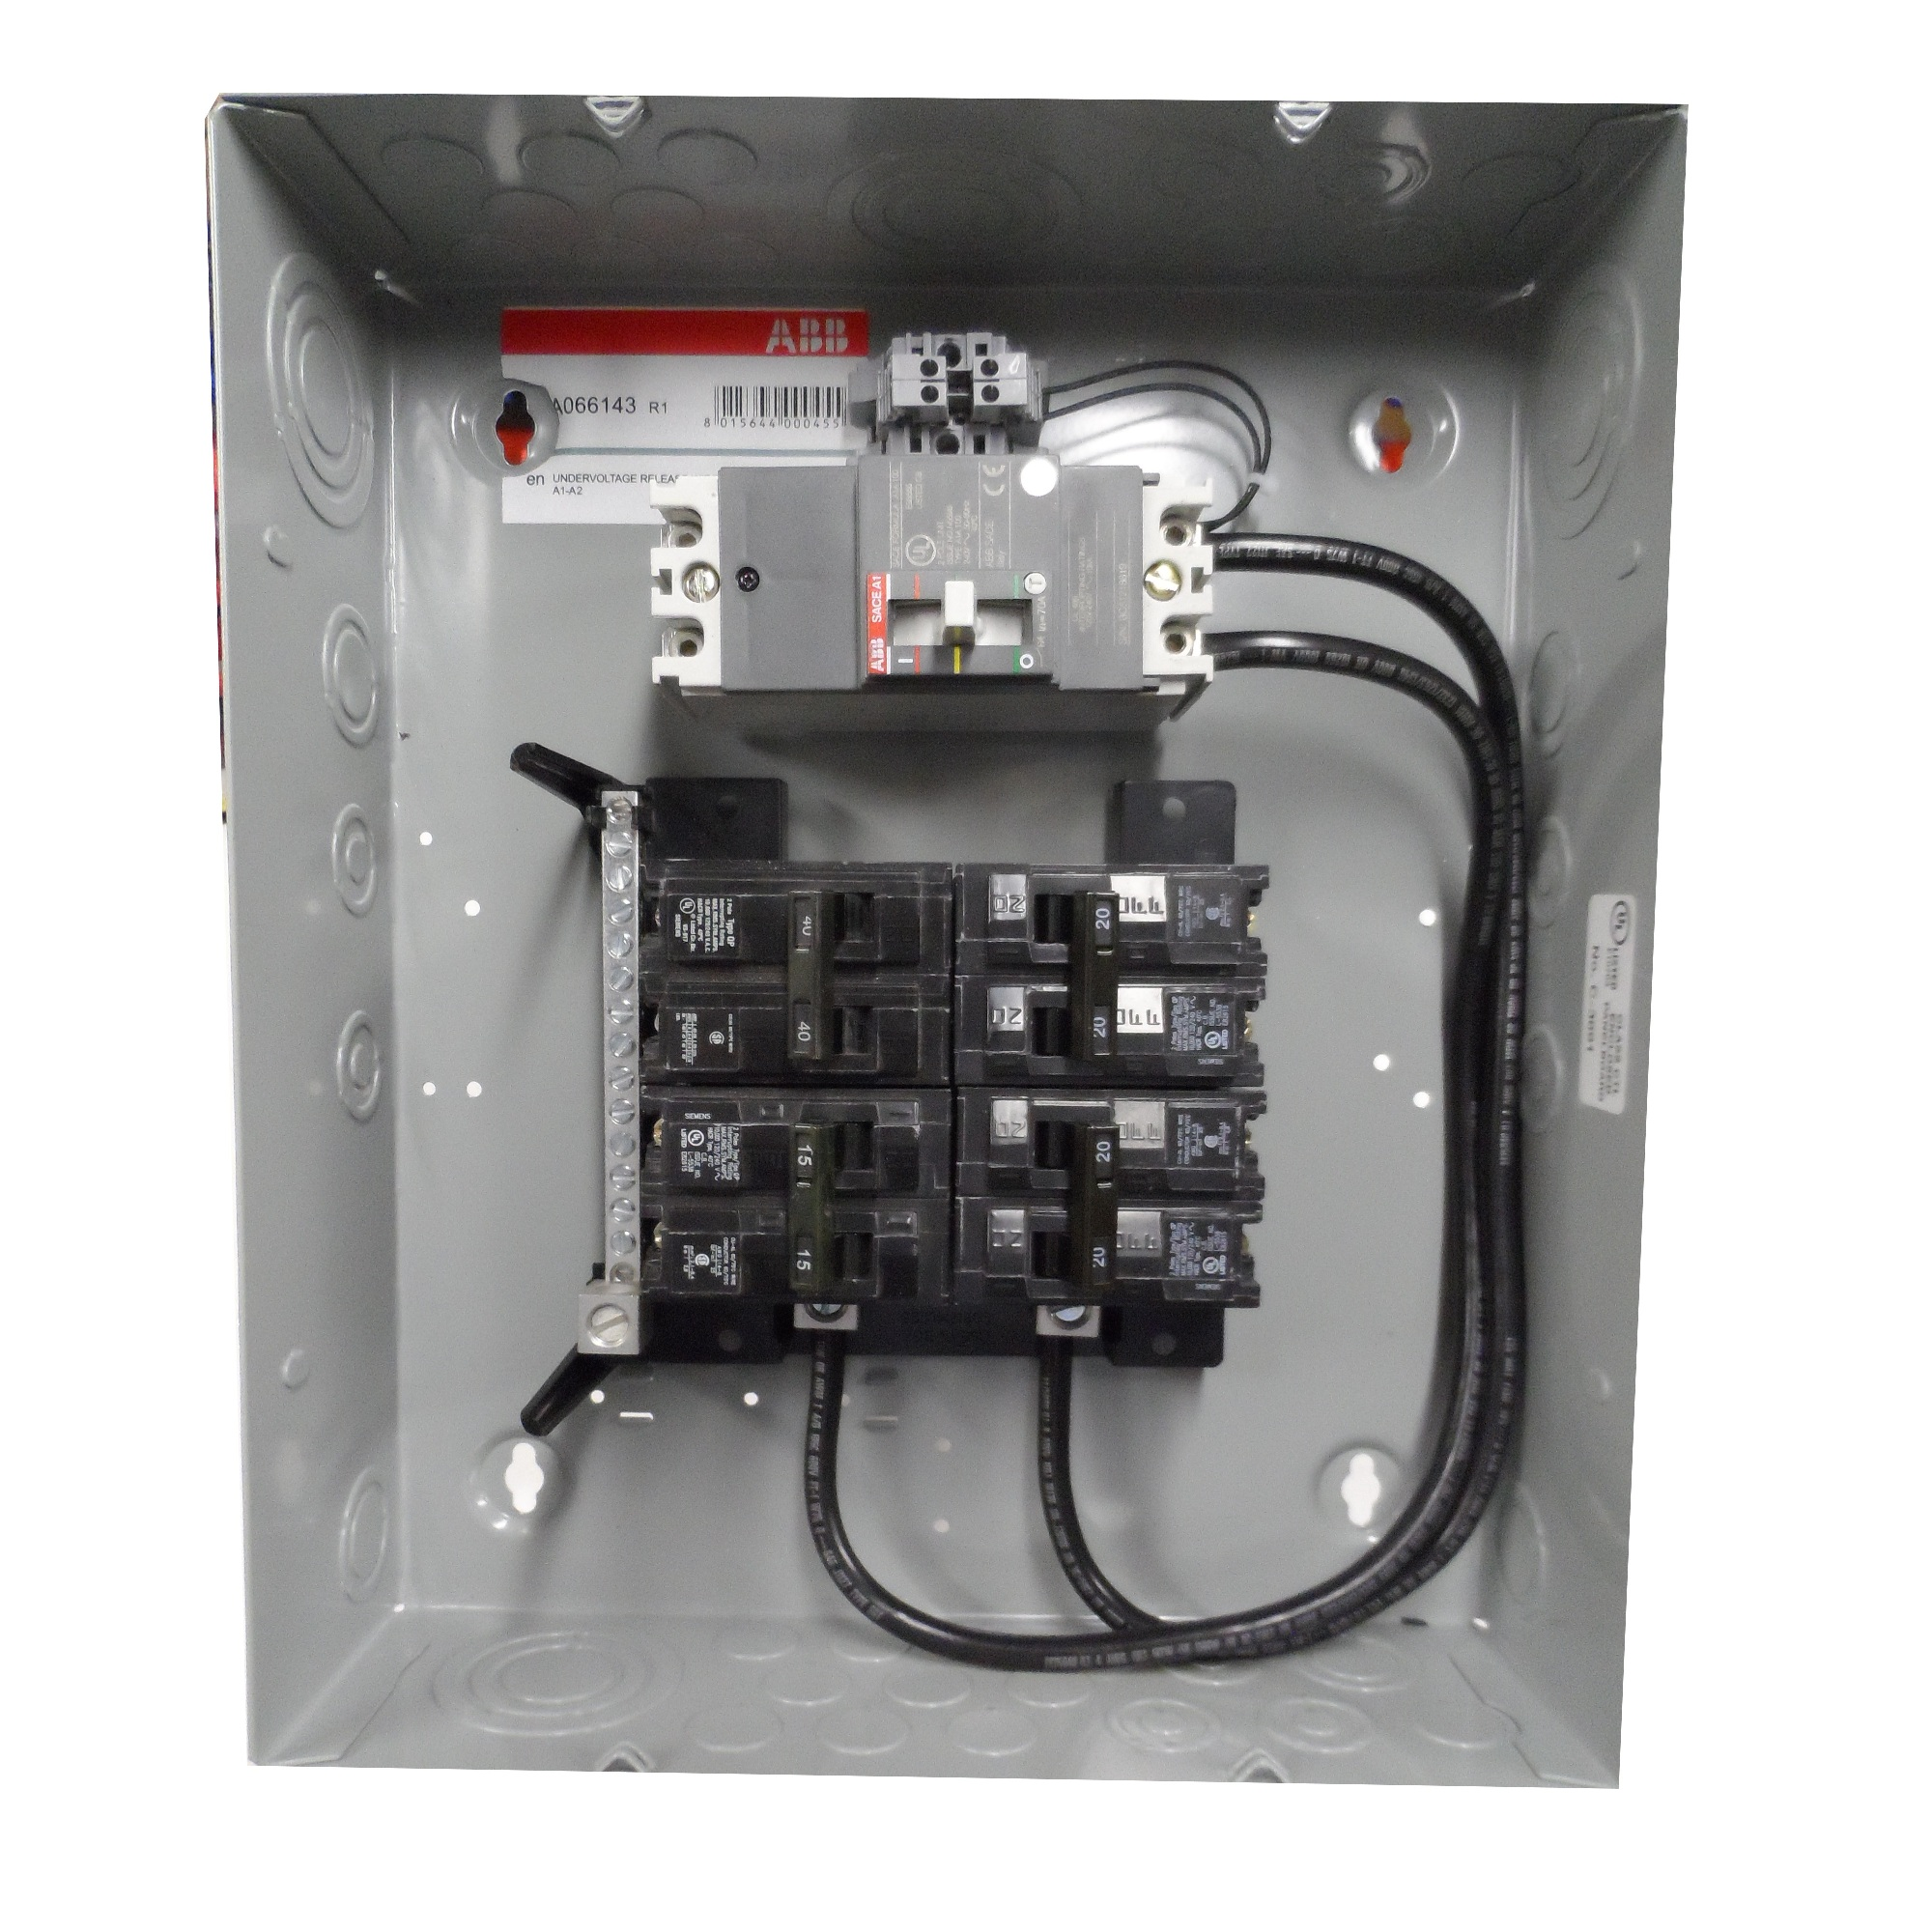 U5b50 U4f9b U5411 U3051 U306c U308a U3048  50 120208v Single Phase Panel